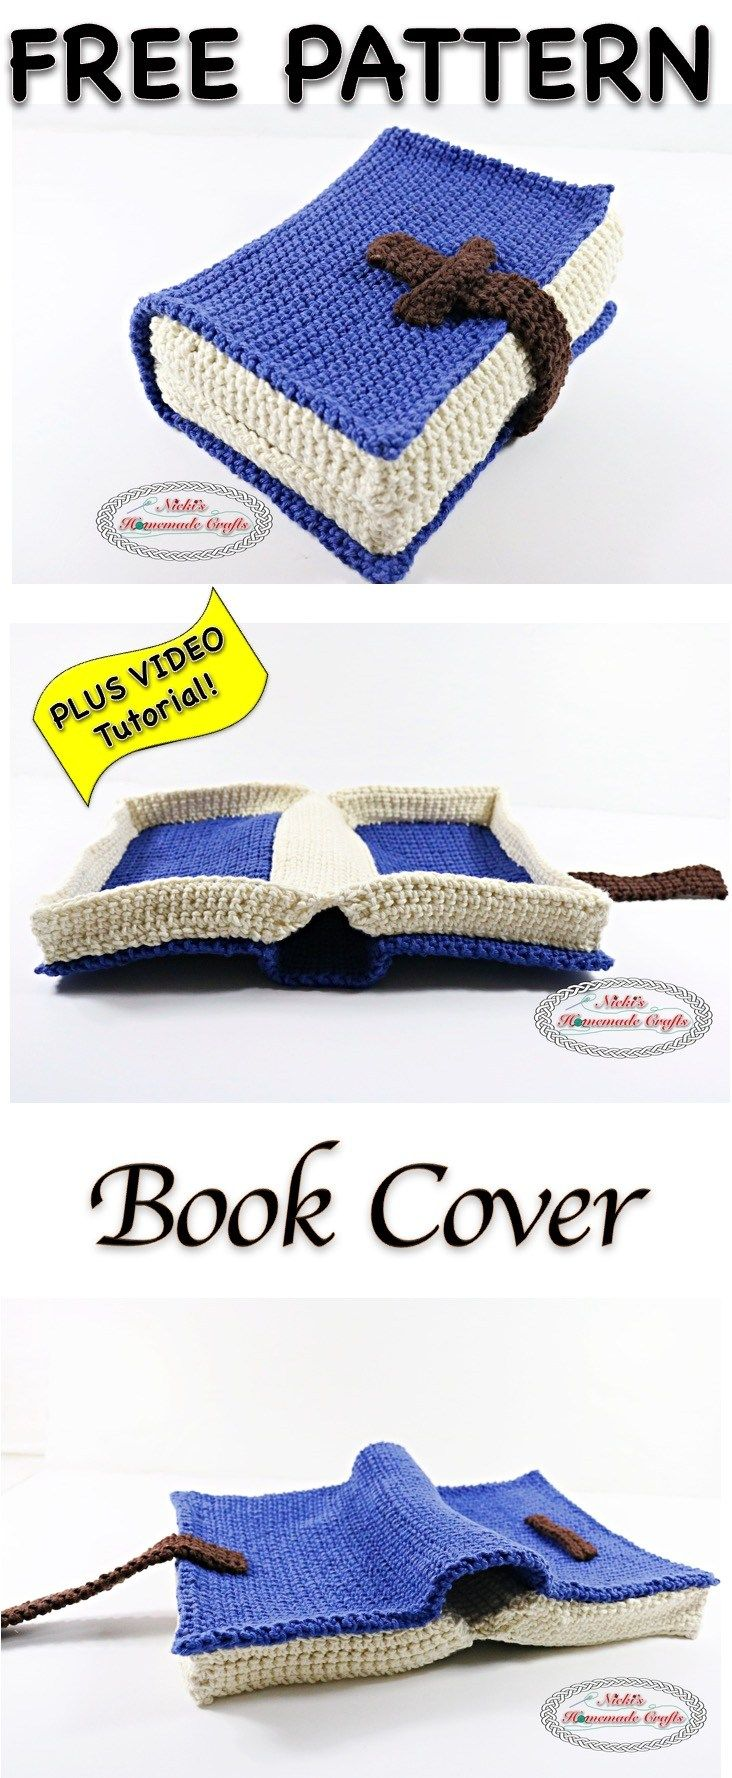 Book Cover - Free Crochet Pattern   Pinterest   Ganchillo, Tejido y ...